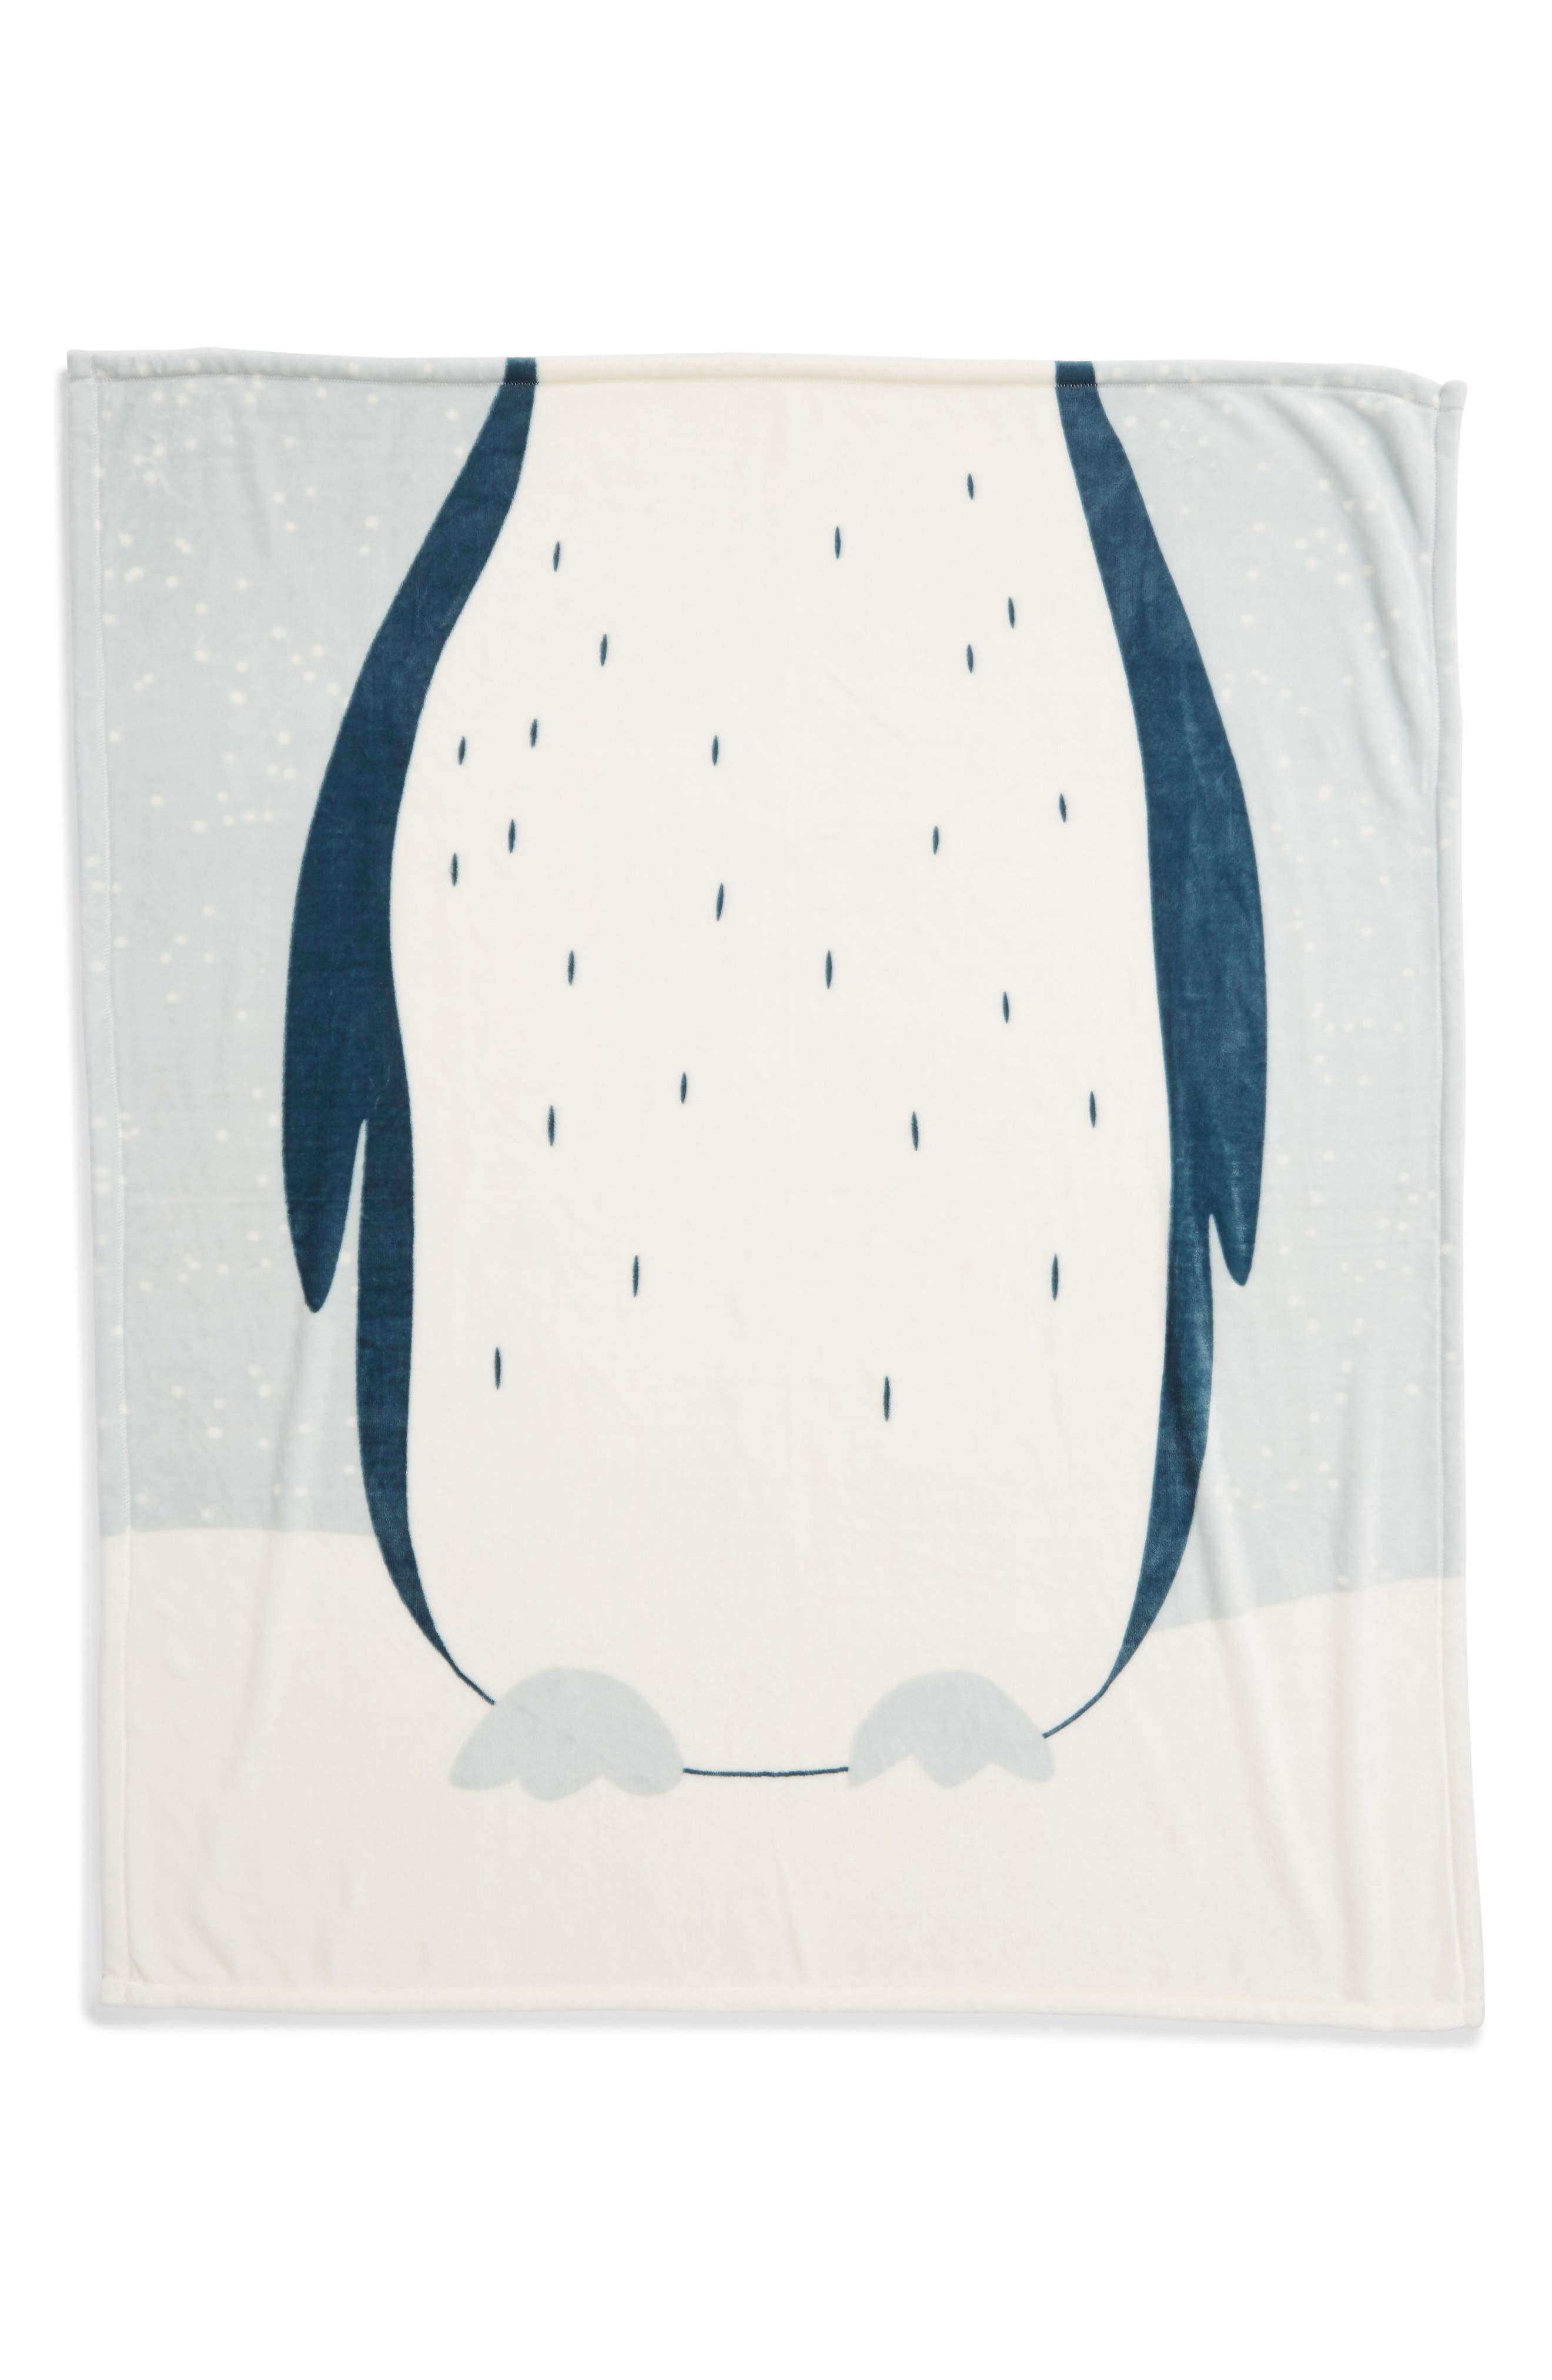 NORDSTROM AT HOME,                             Penguin Suit Plush Throw,                             Alternate thumbnail 3, color,                             TEAL MIST PENGUIN